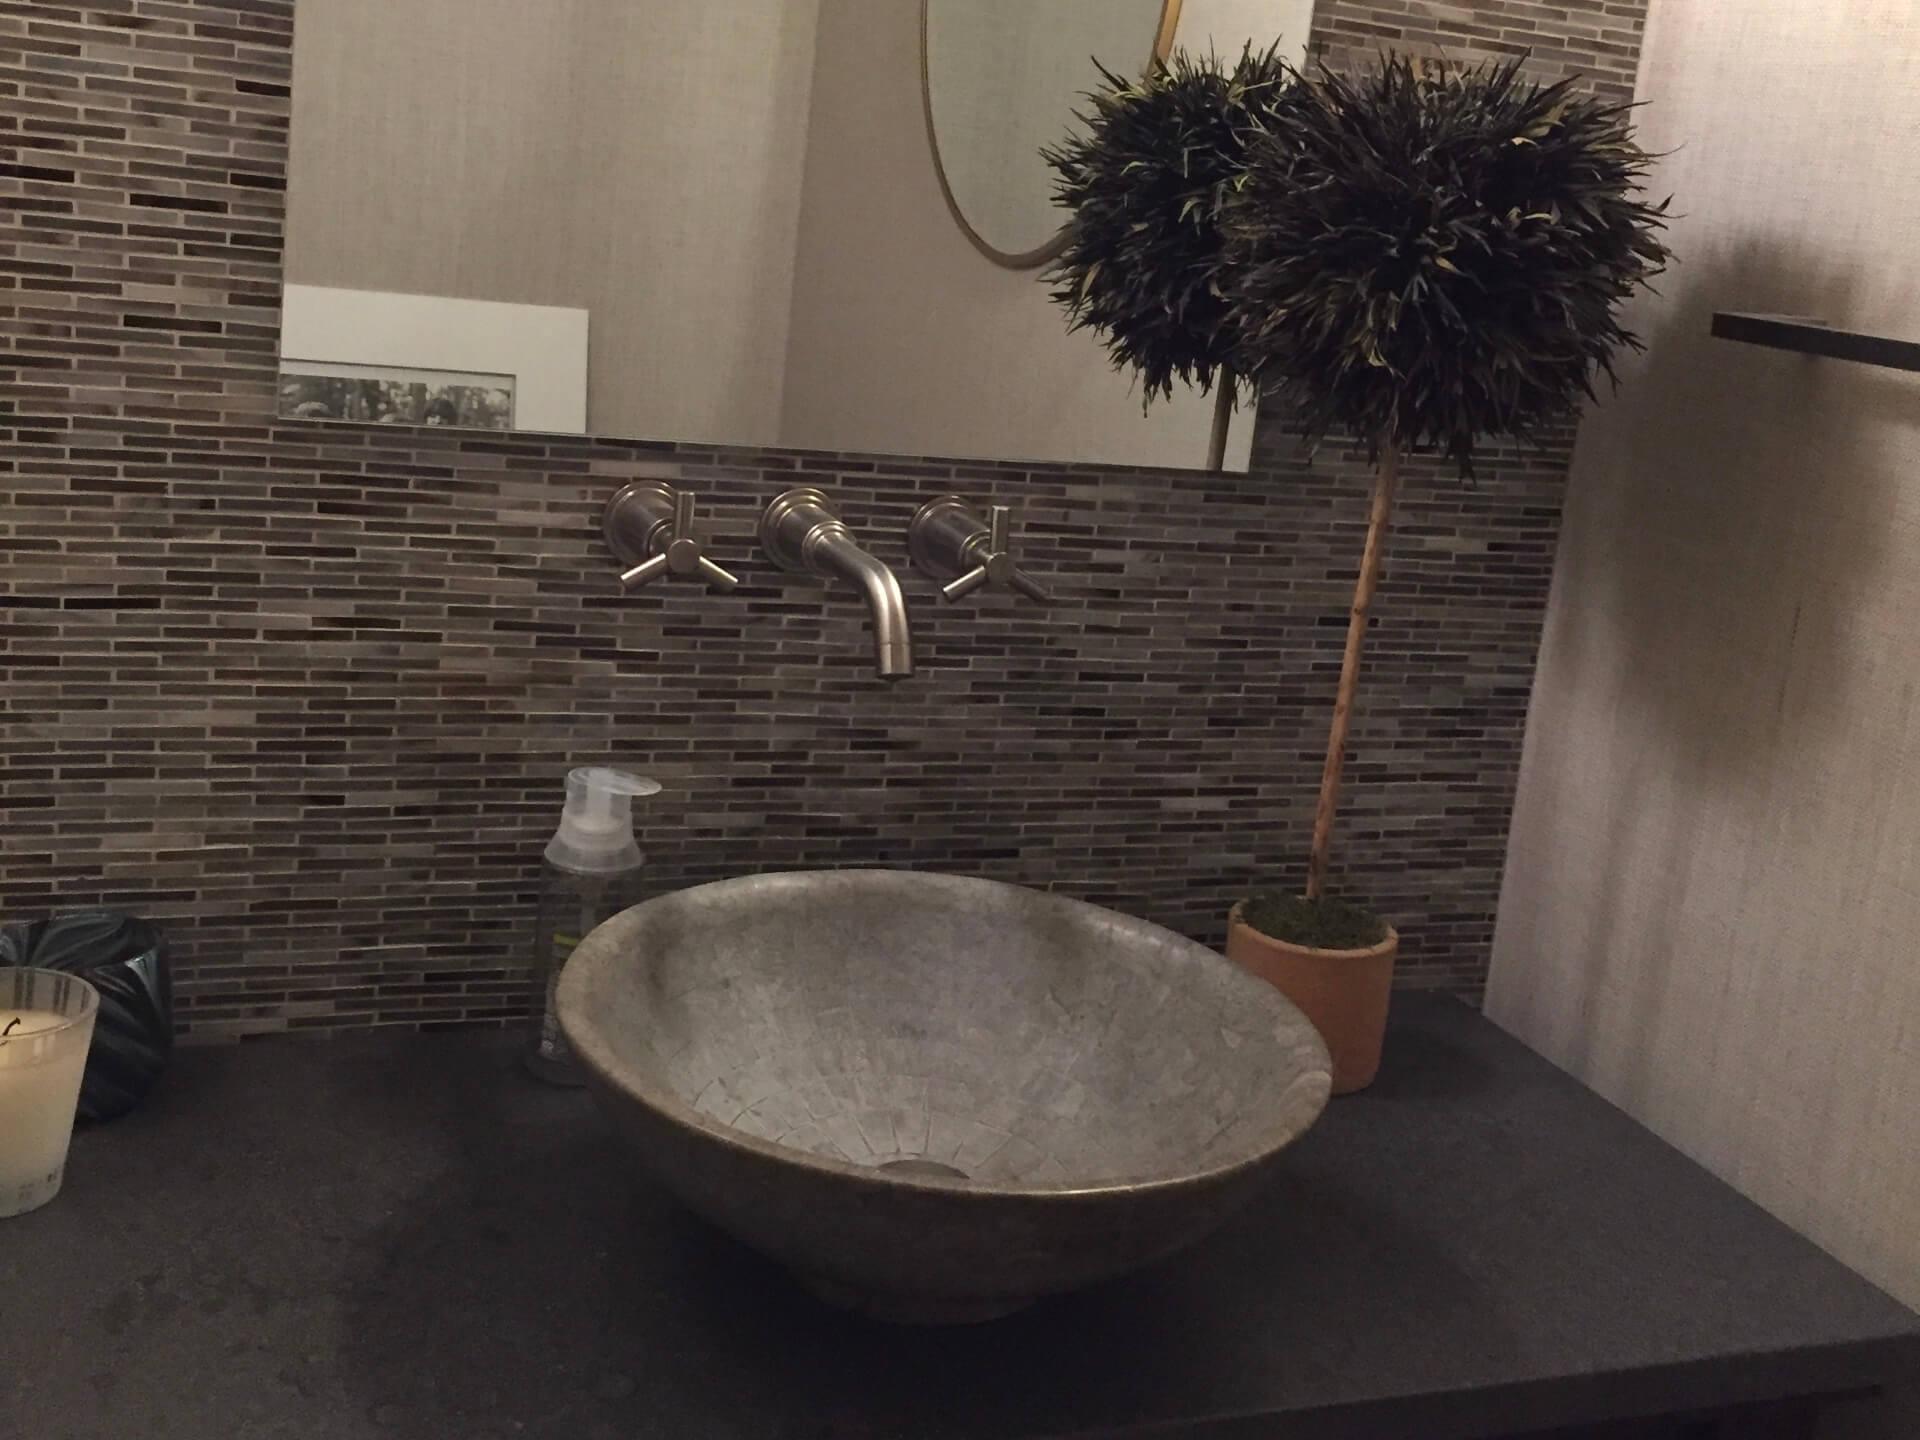 Professional bathroom remodel in Bellevue, WA